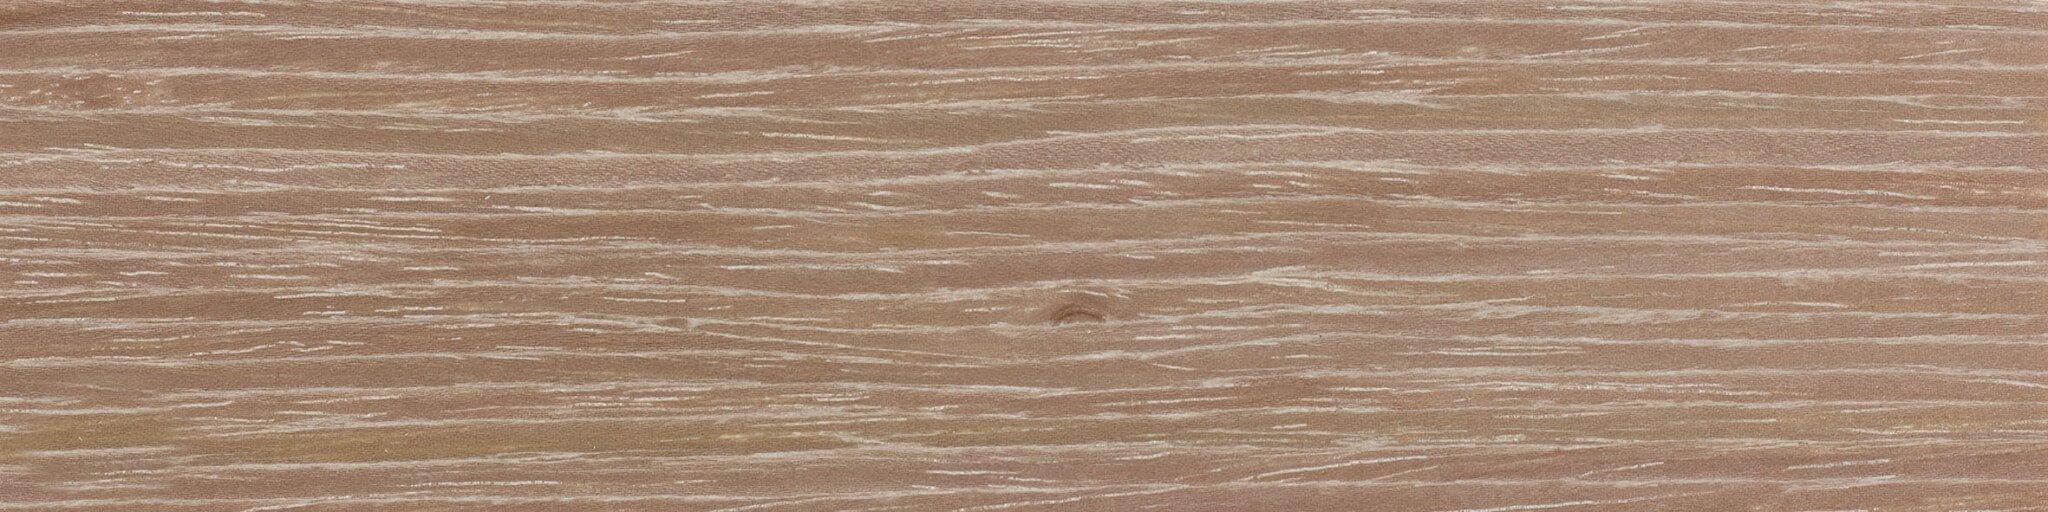 Houten jaloezie 'Plus' 301621 – Rustiek hout – Duin – Max 2400 mm breed – meest gekozen